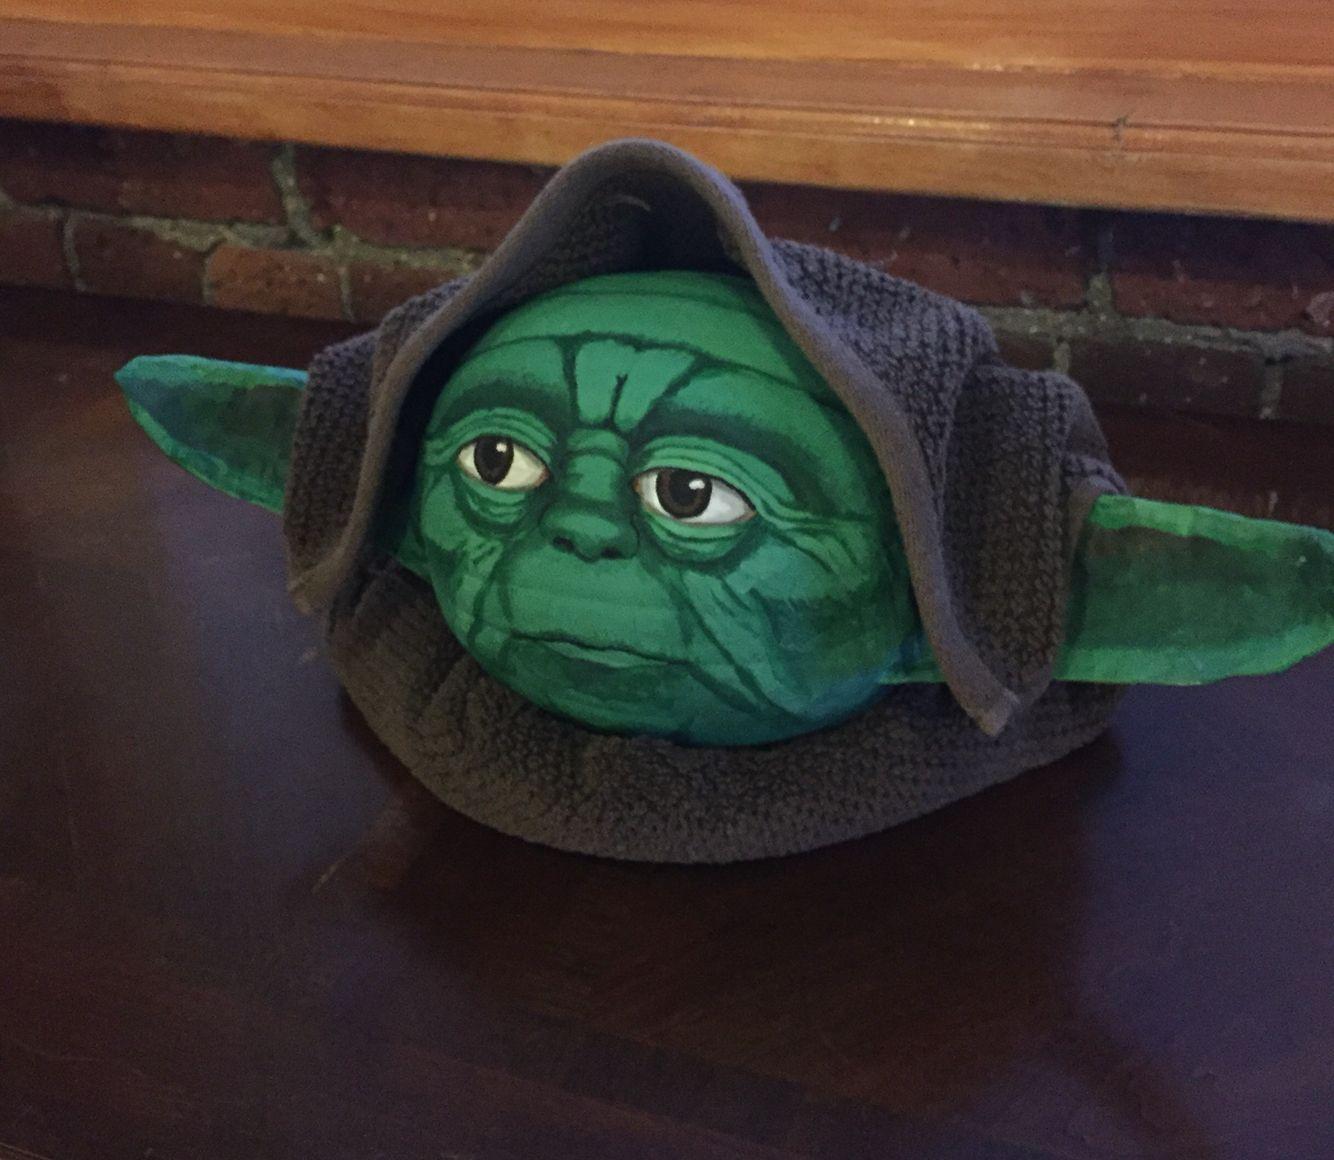 Shop Towels Paper Mache: Painted Yoda Pumpkin For 2015 Work Contest! Paper Mache